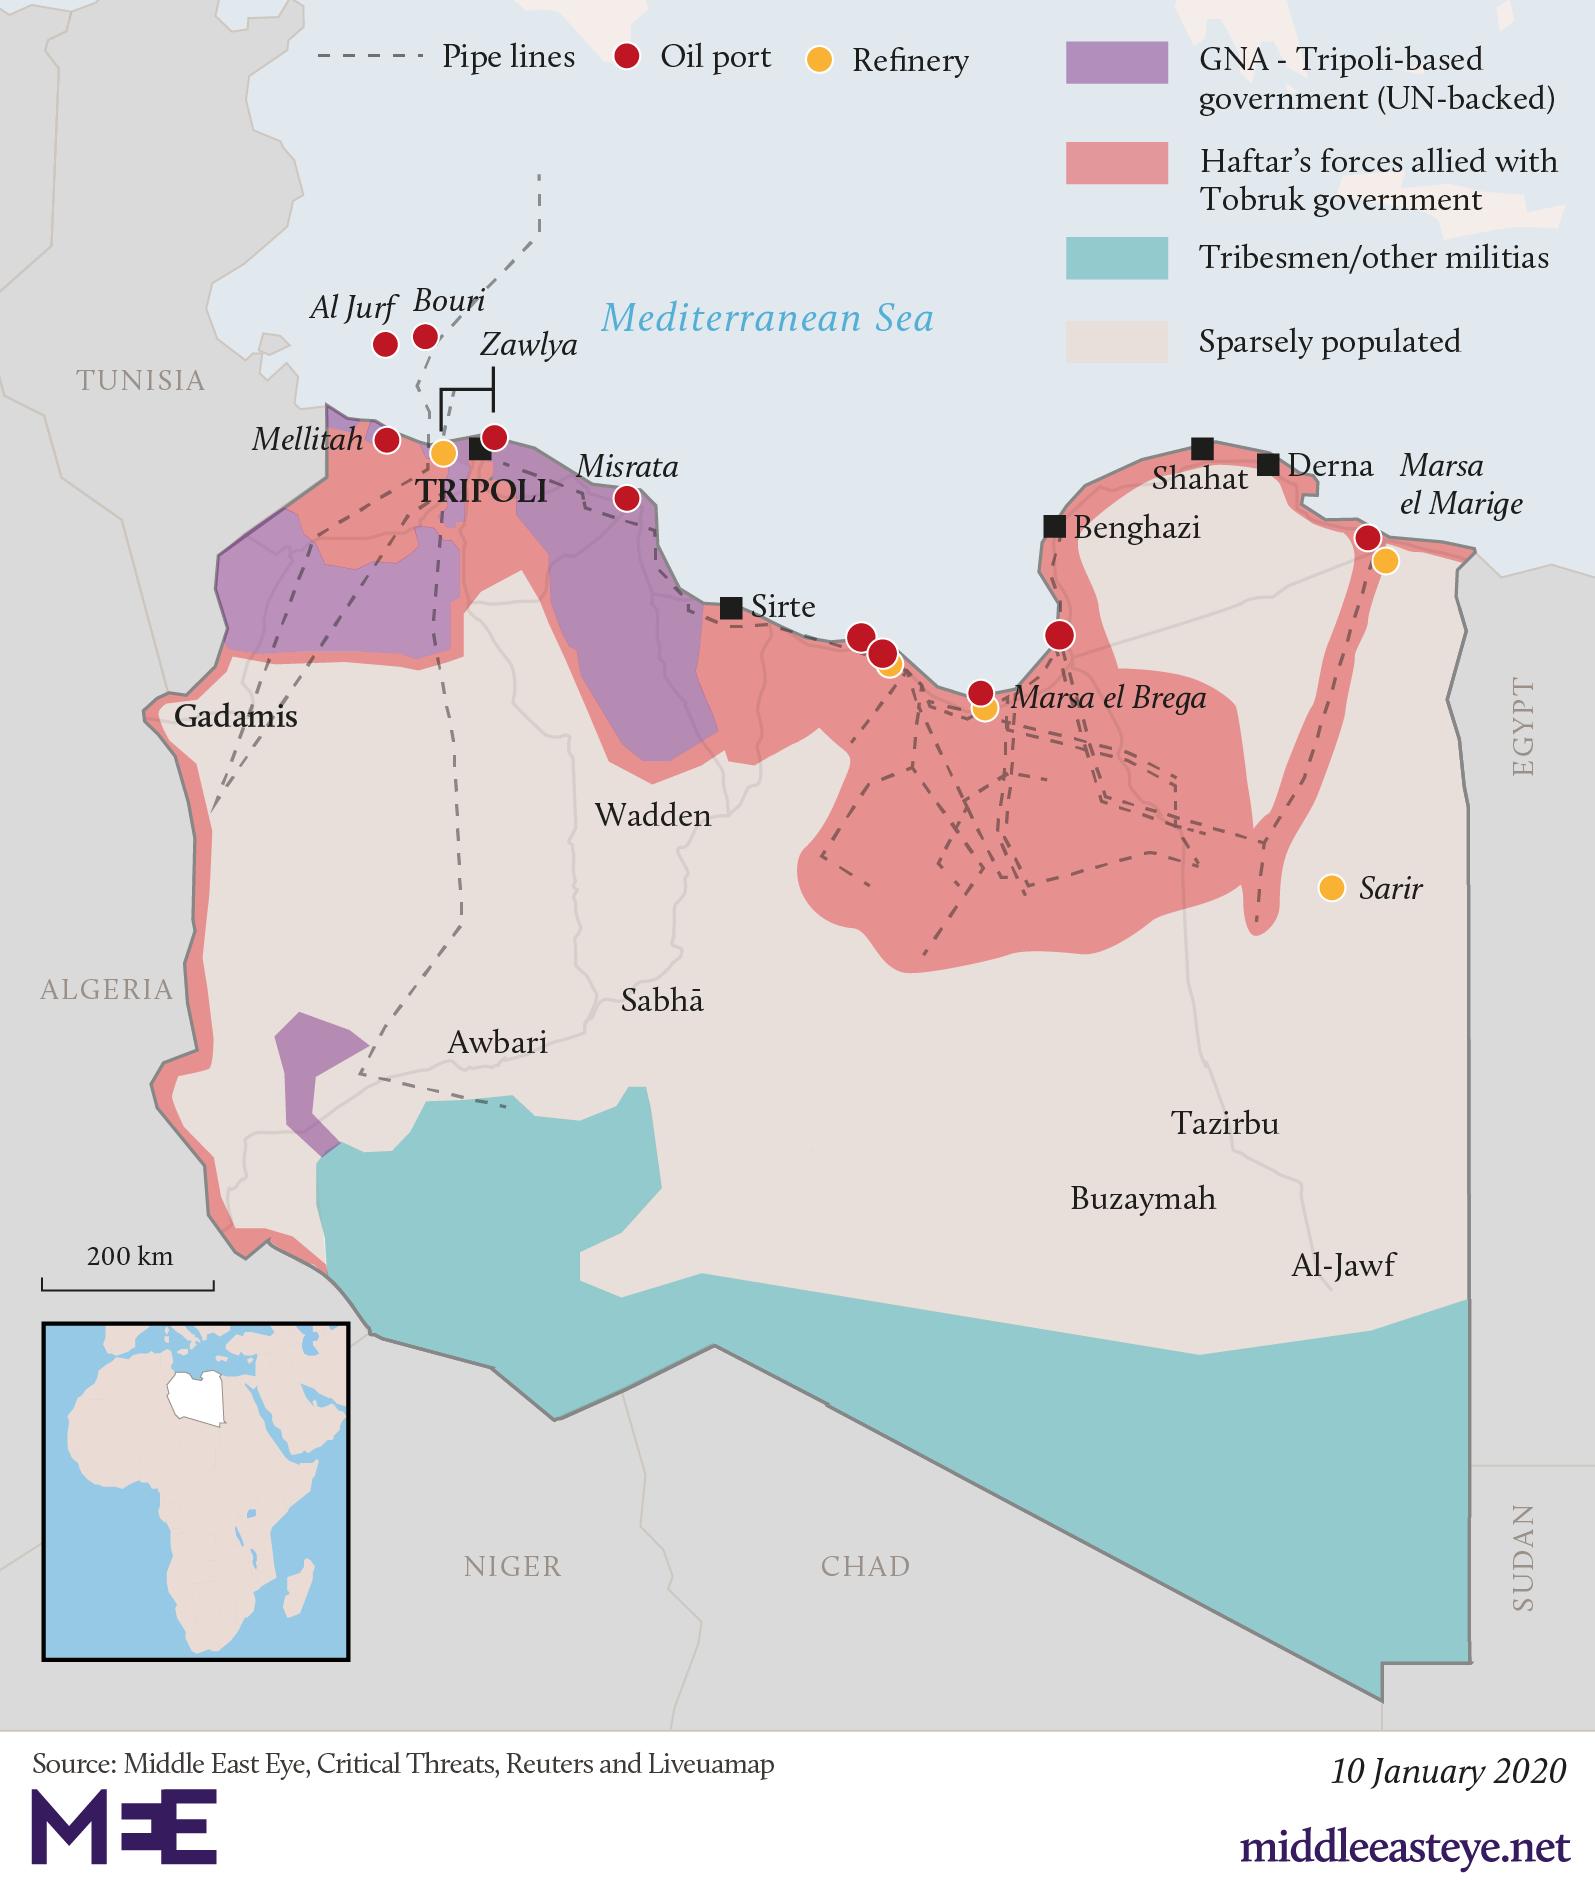 Libya: Who controls what